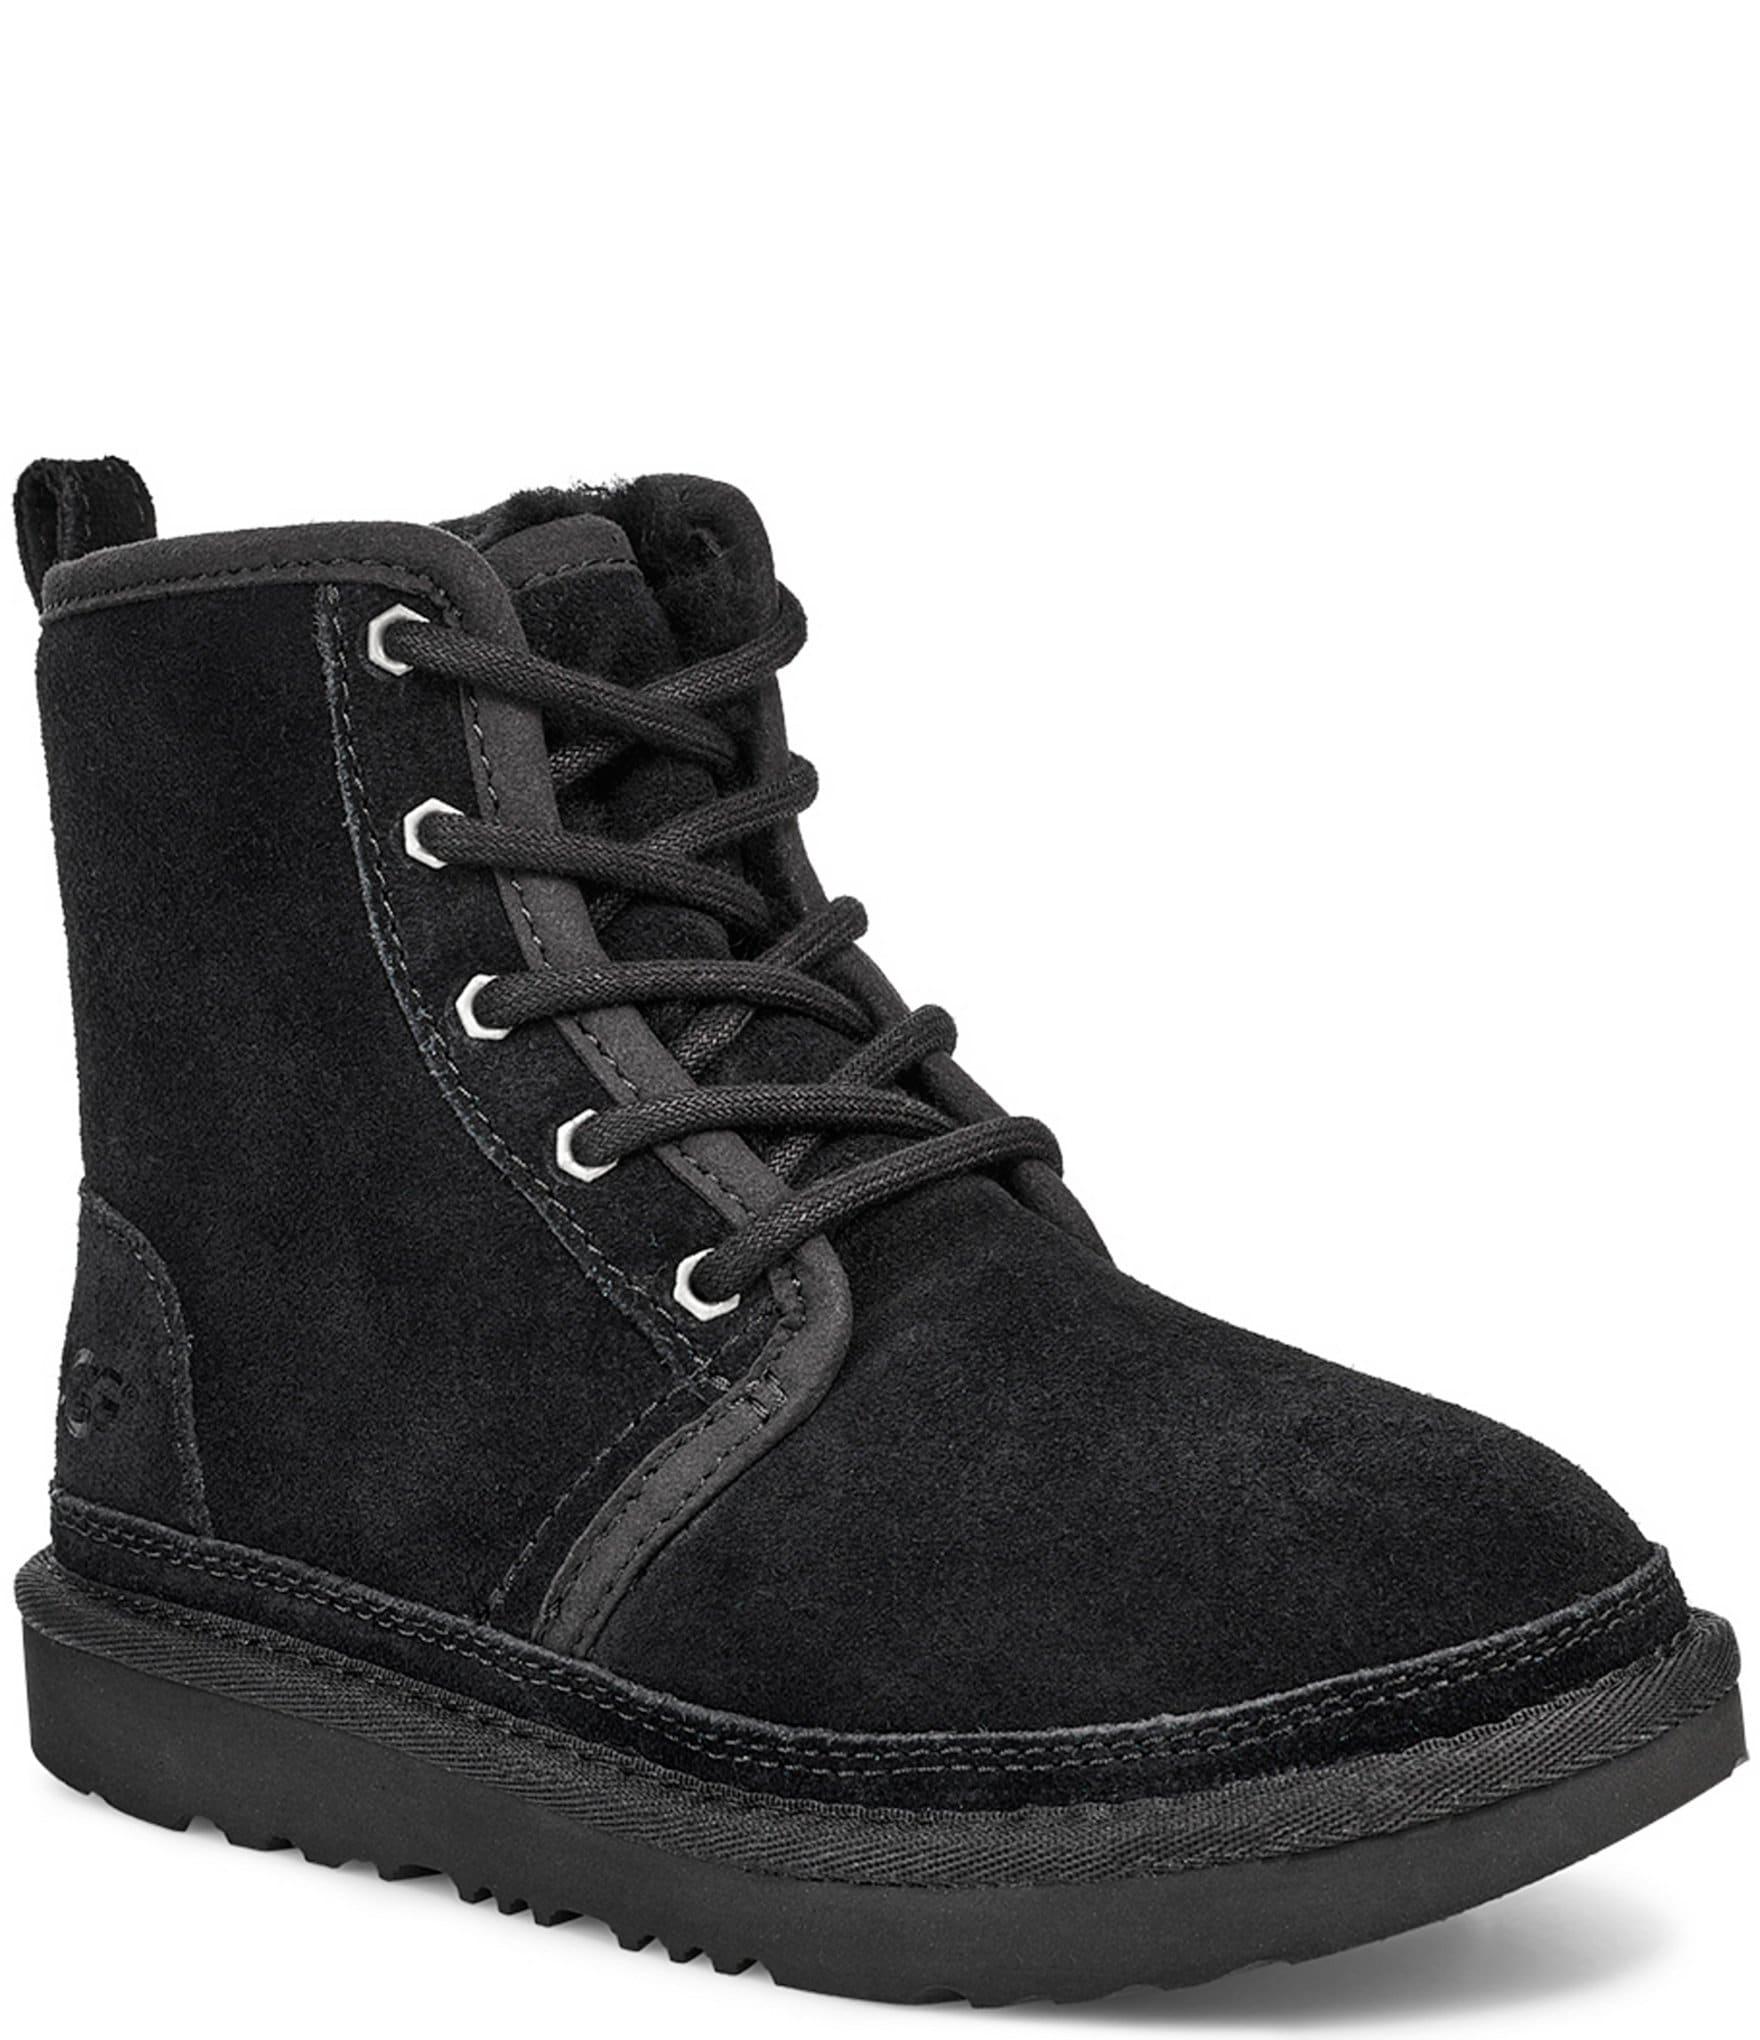 UGG Youth Boys  Shoes  1baf9345cb00